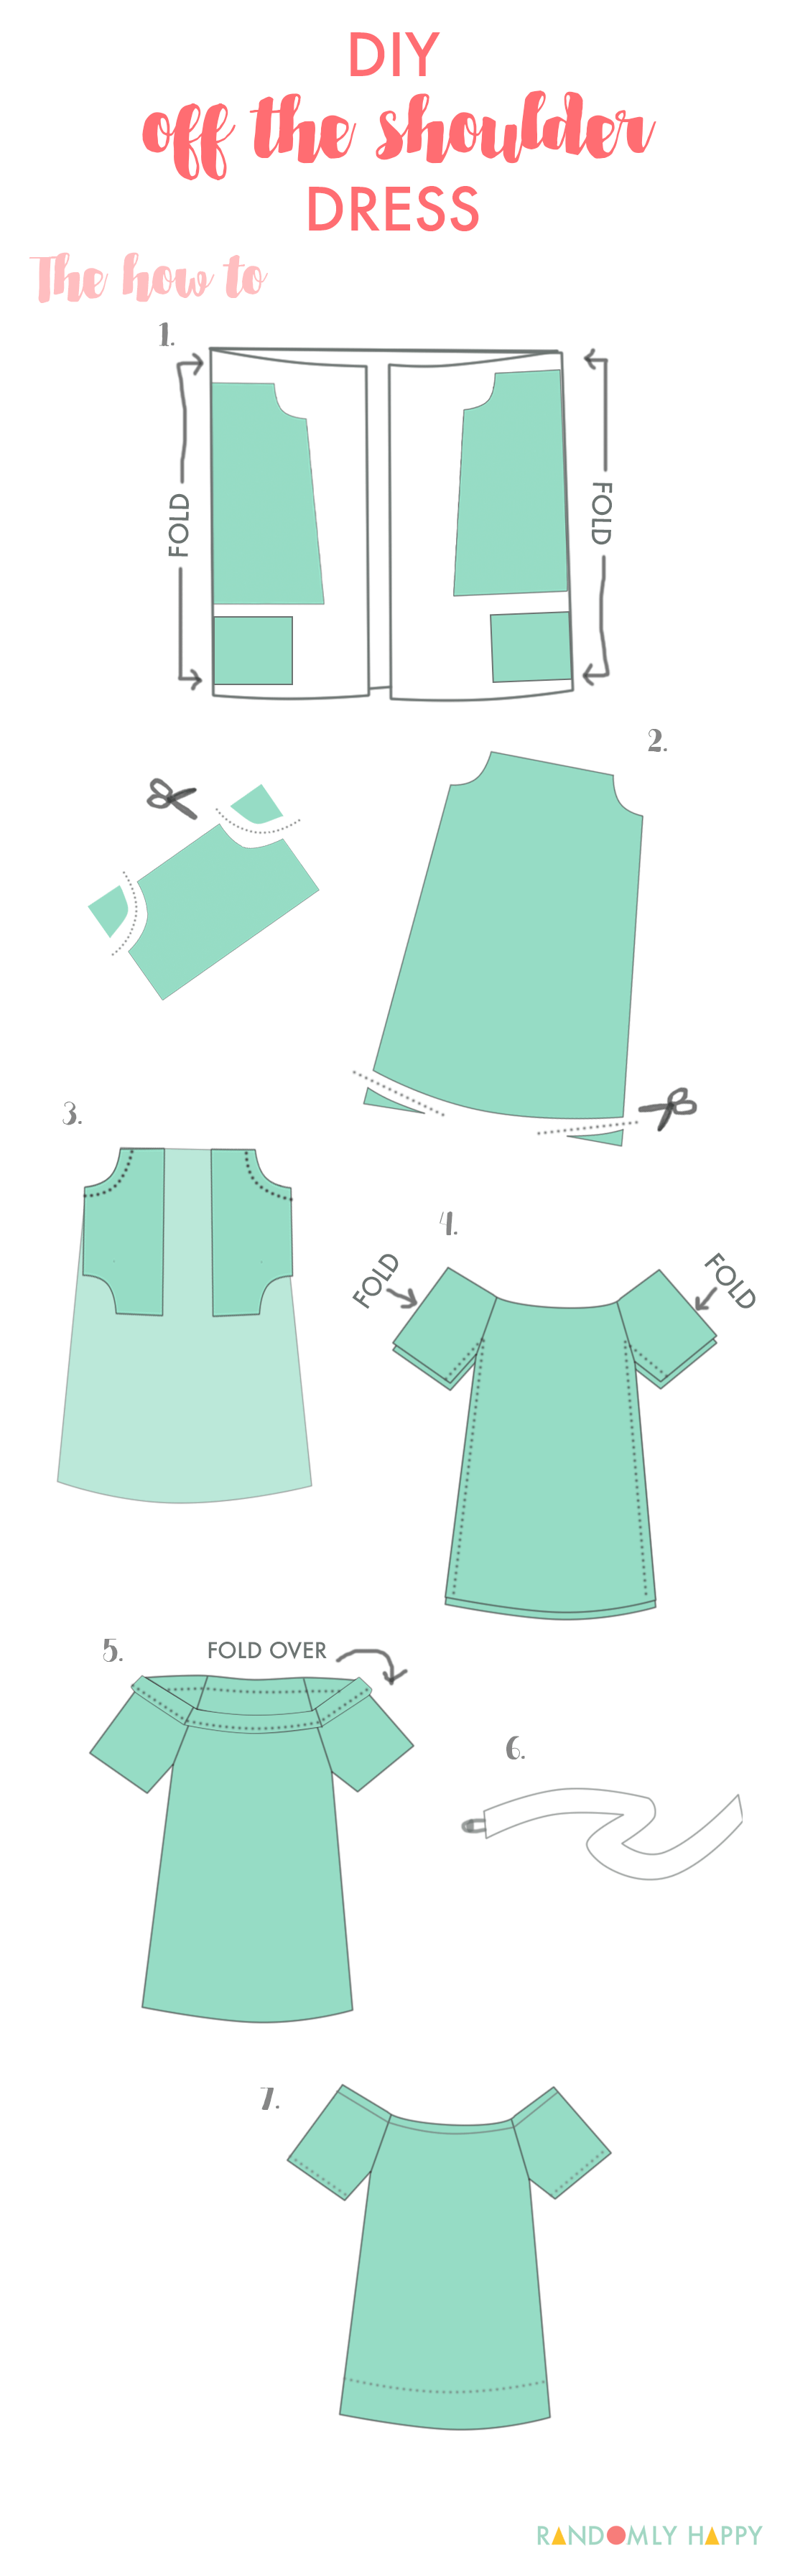 DIY off the shoulder summer dress (how to | Costura, Patrones y ...